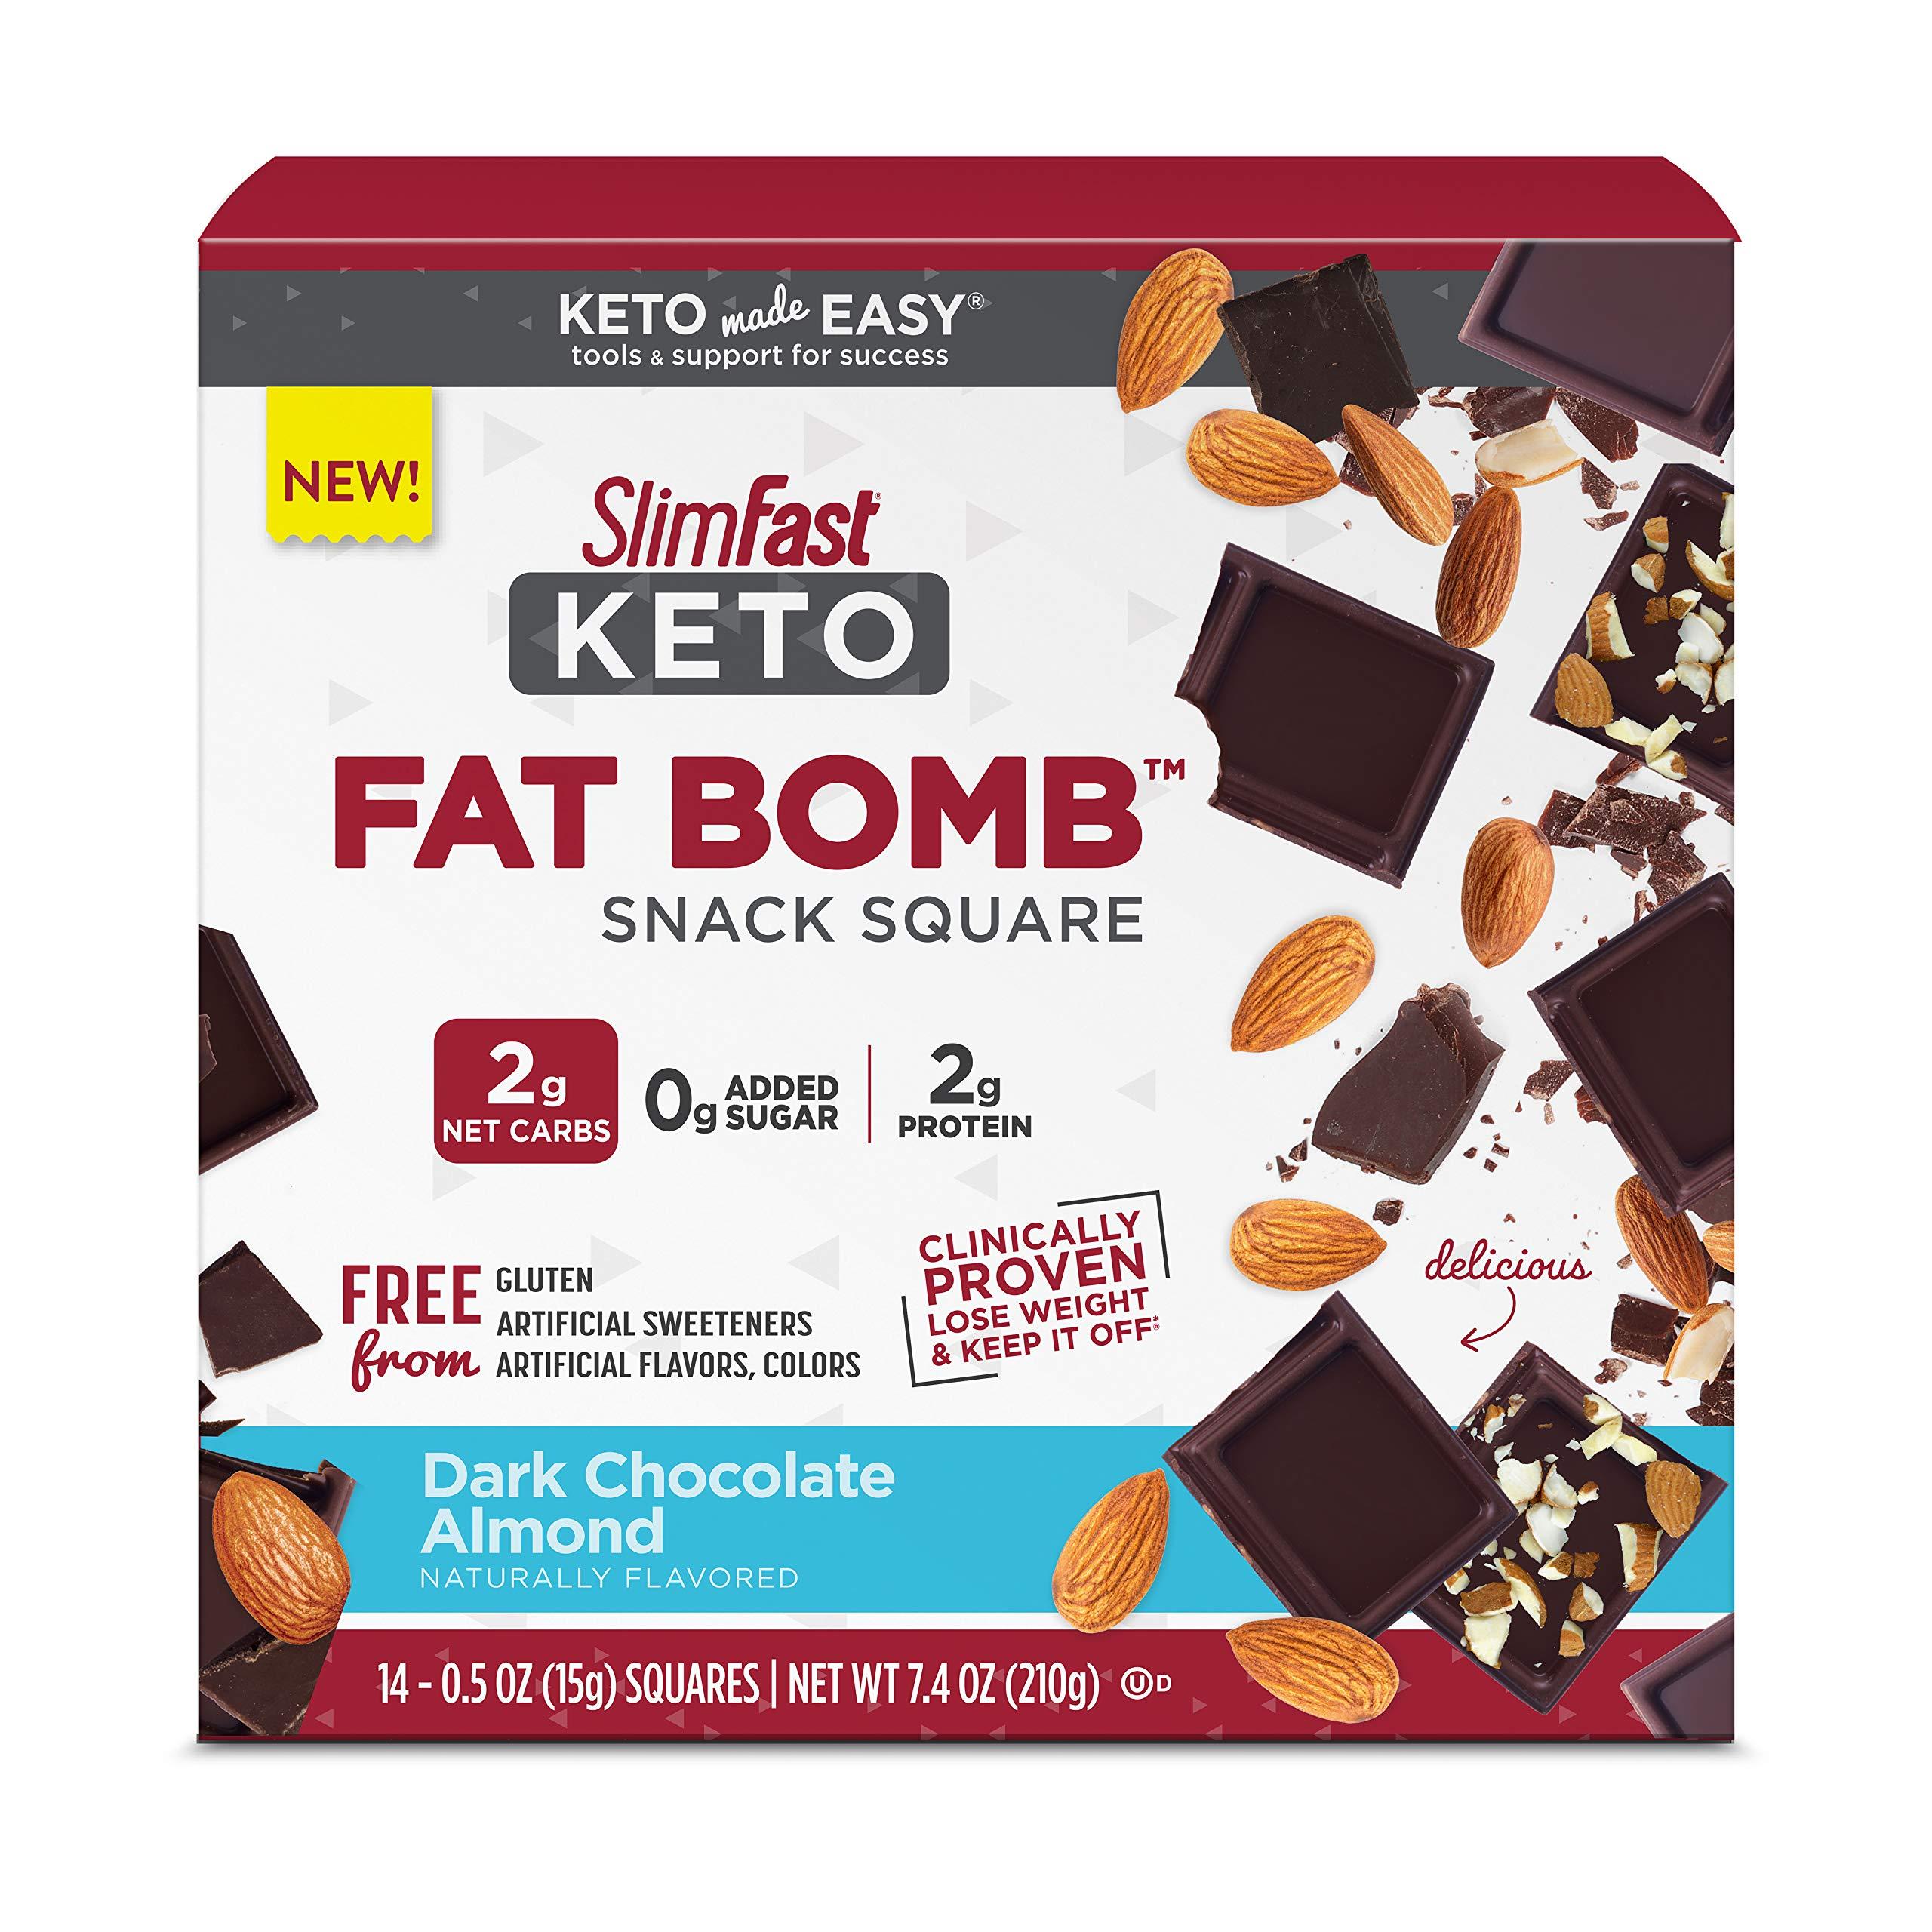 SlimFast Keto Fat Bomb Snack Squares - Dark Chocolate Almond Squares - 14 Count Box - Pantry Friendly $4.81